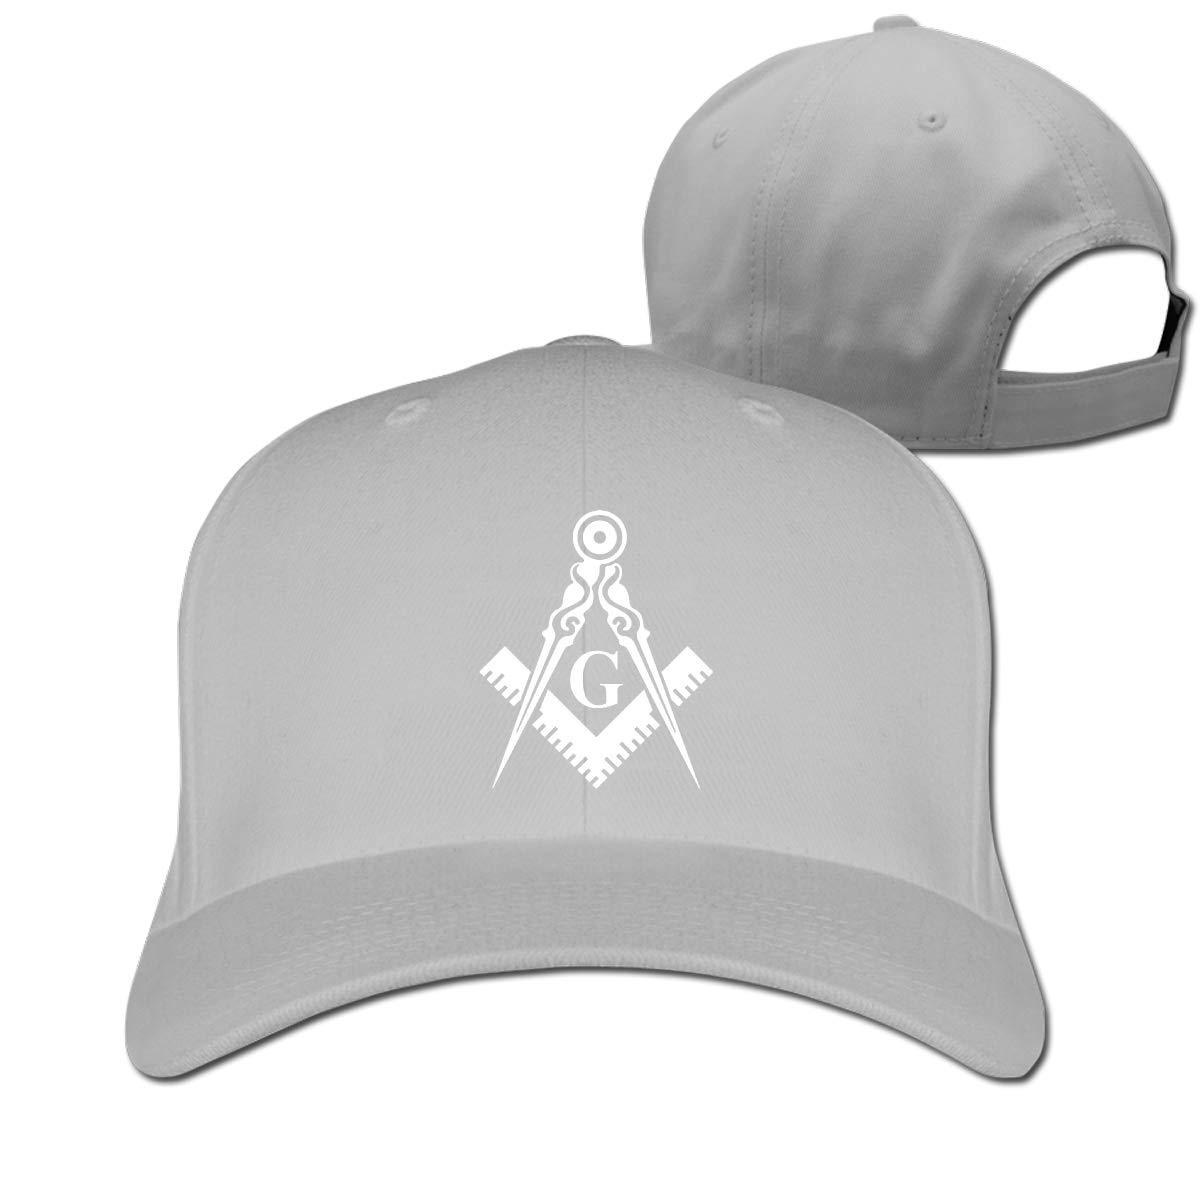 Gorra de béisbol ajustable Unisex de masón, gorra de béisbol lisa, gorra de béisbol de Golf